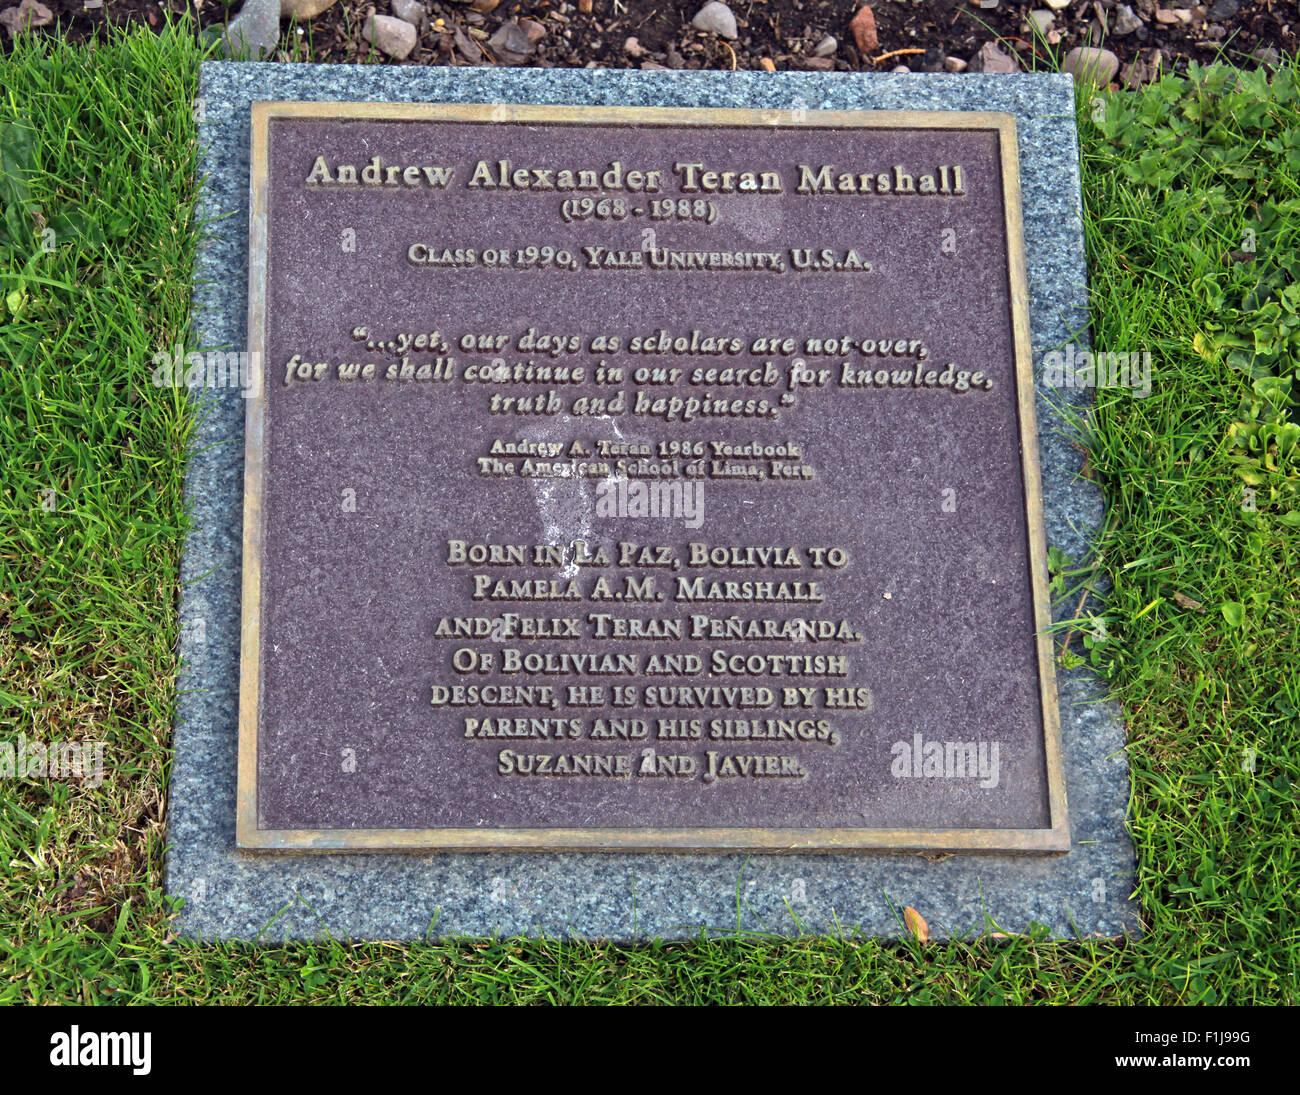 Laden Sie dieses Alamy Stockfoto Lockerbie PanAm103 In Erinnerung Memorial Andrew Alexander Teran Marshall, Schottland - F1J99G